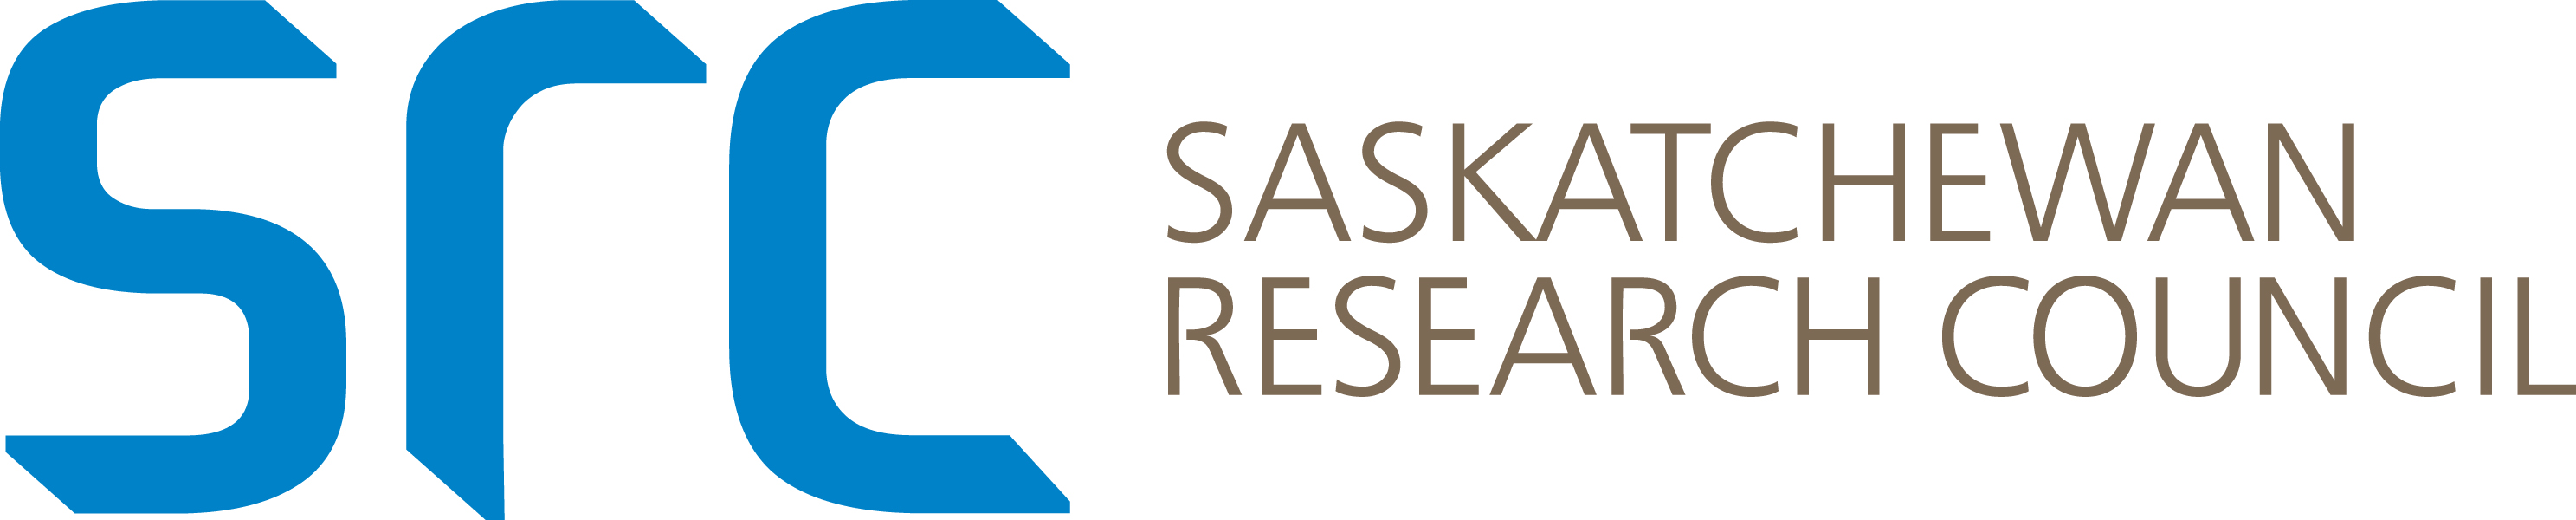 Sask Research Council